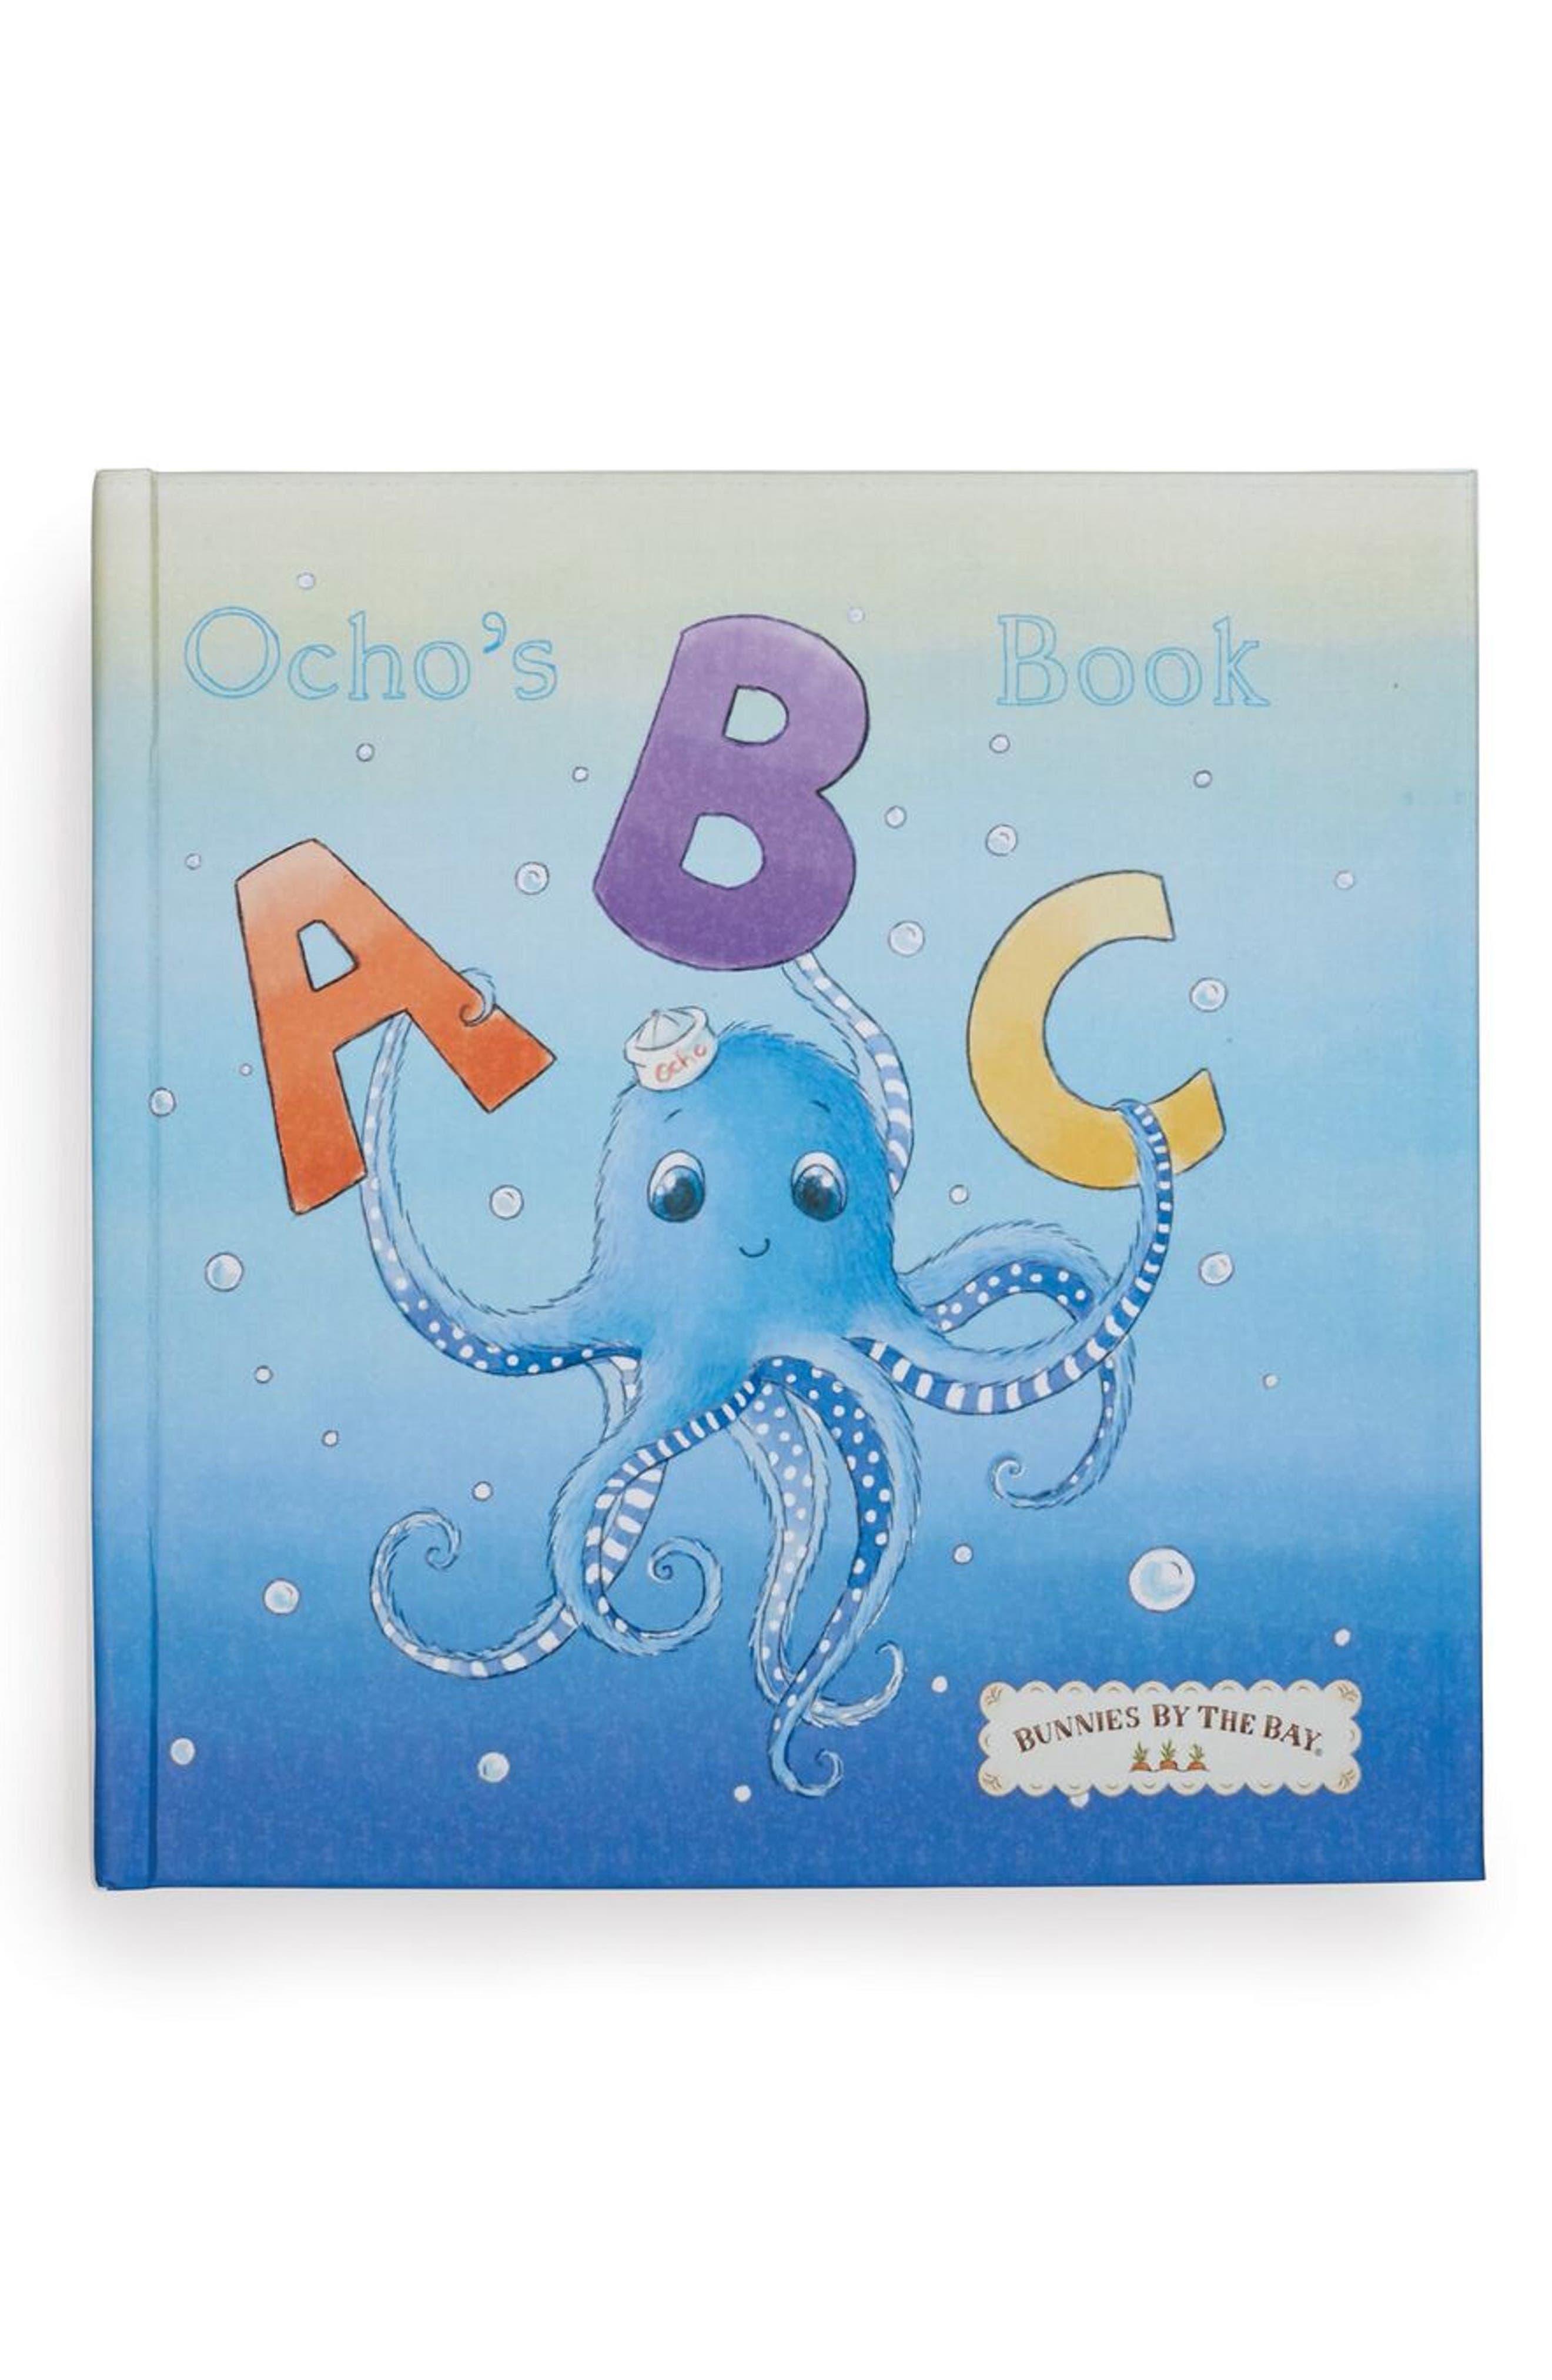 Bunnies by the Bay Ocho's ABC Book